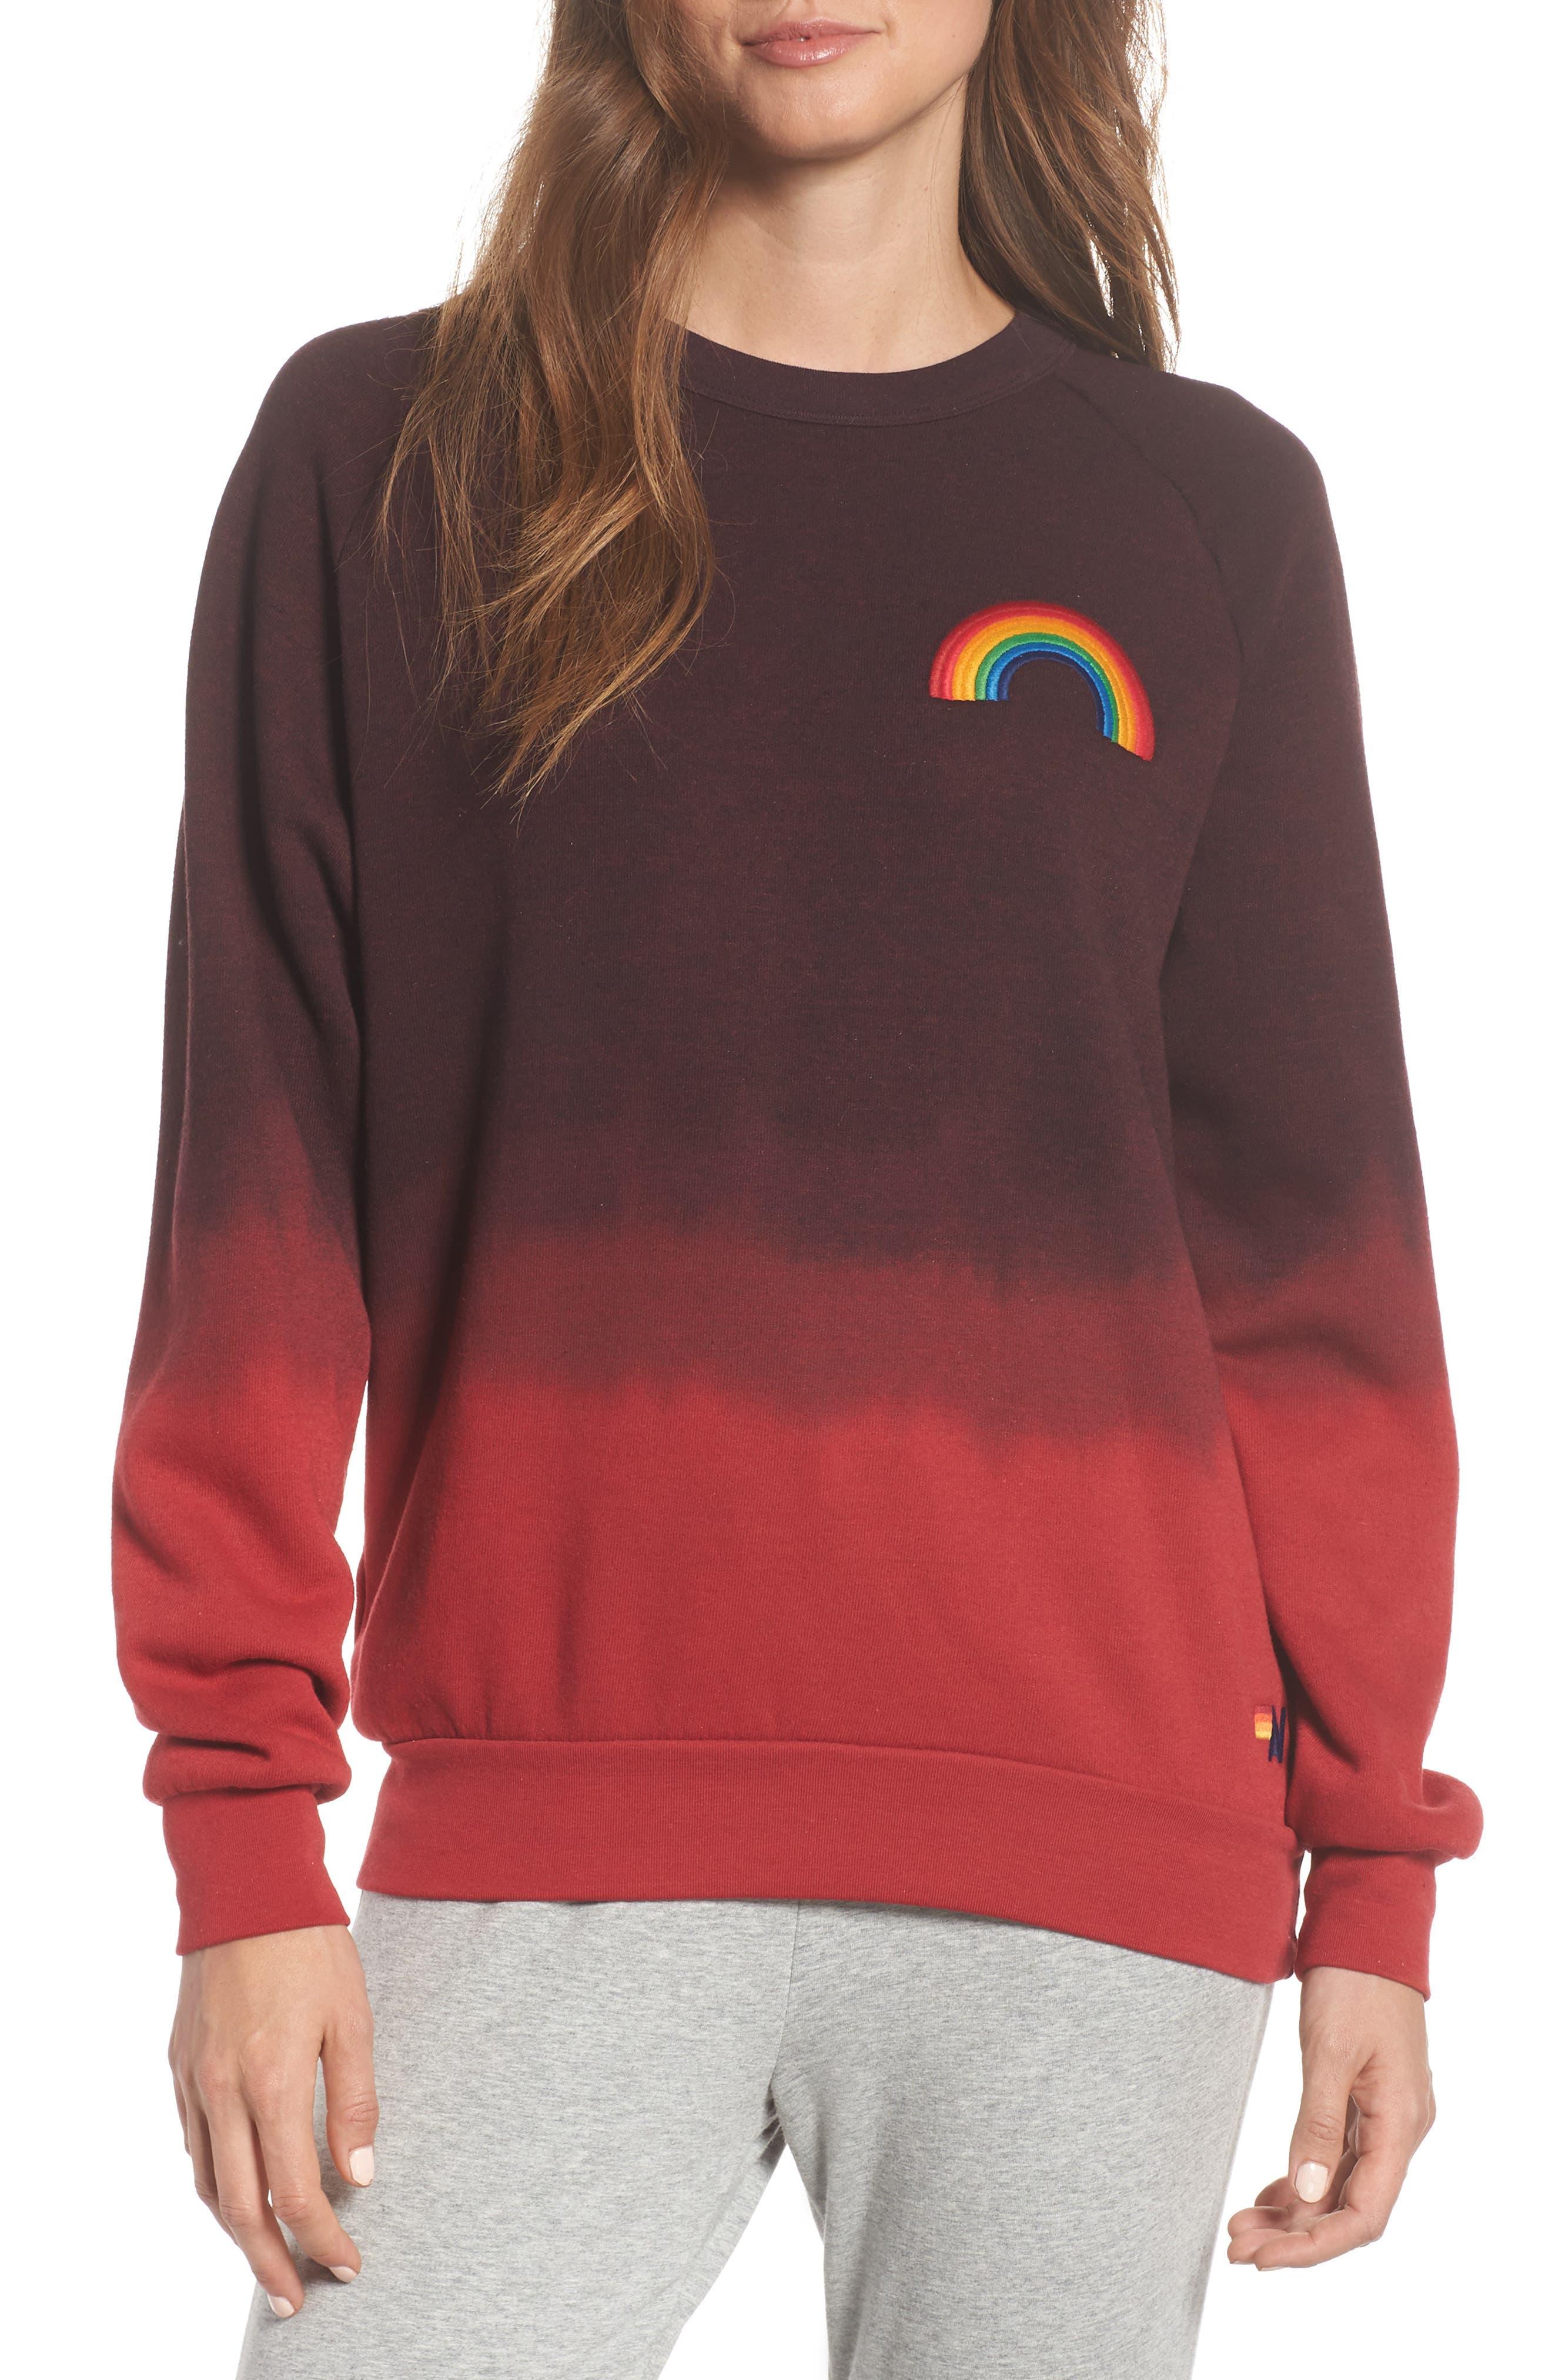 Aviator Nation Rainbow Fade Crewneck Sweatshirt